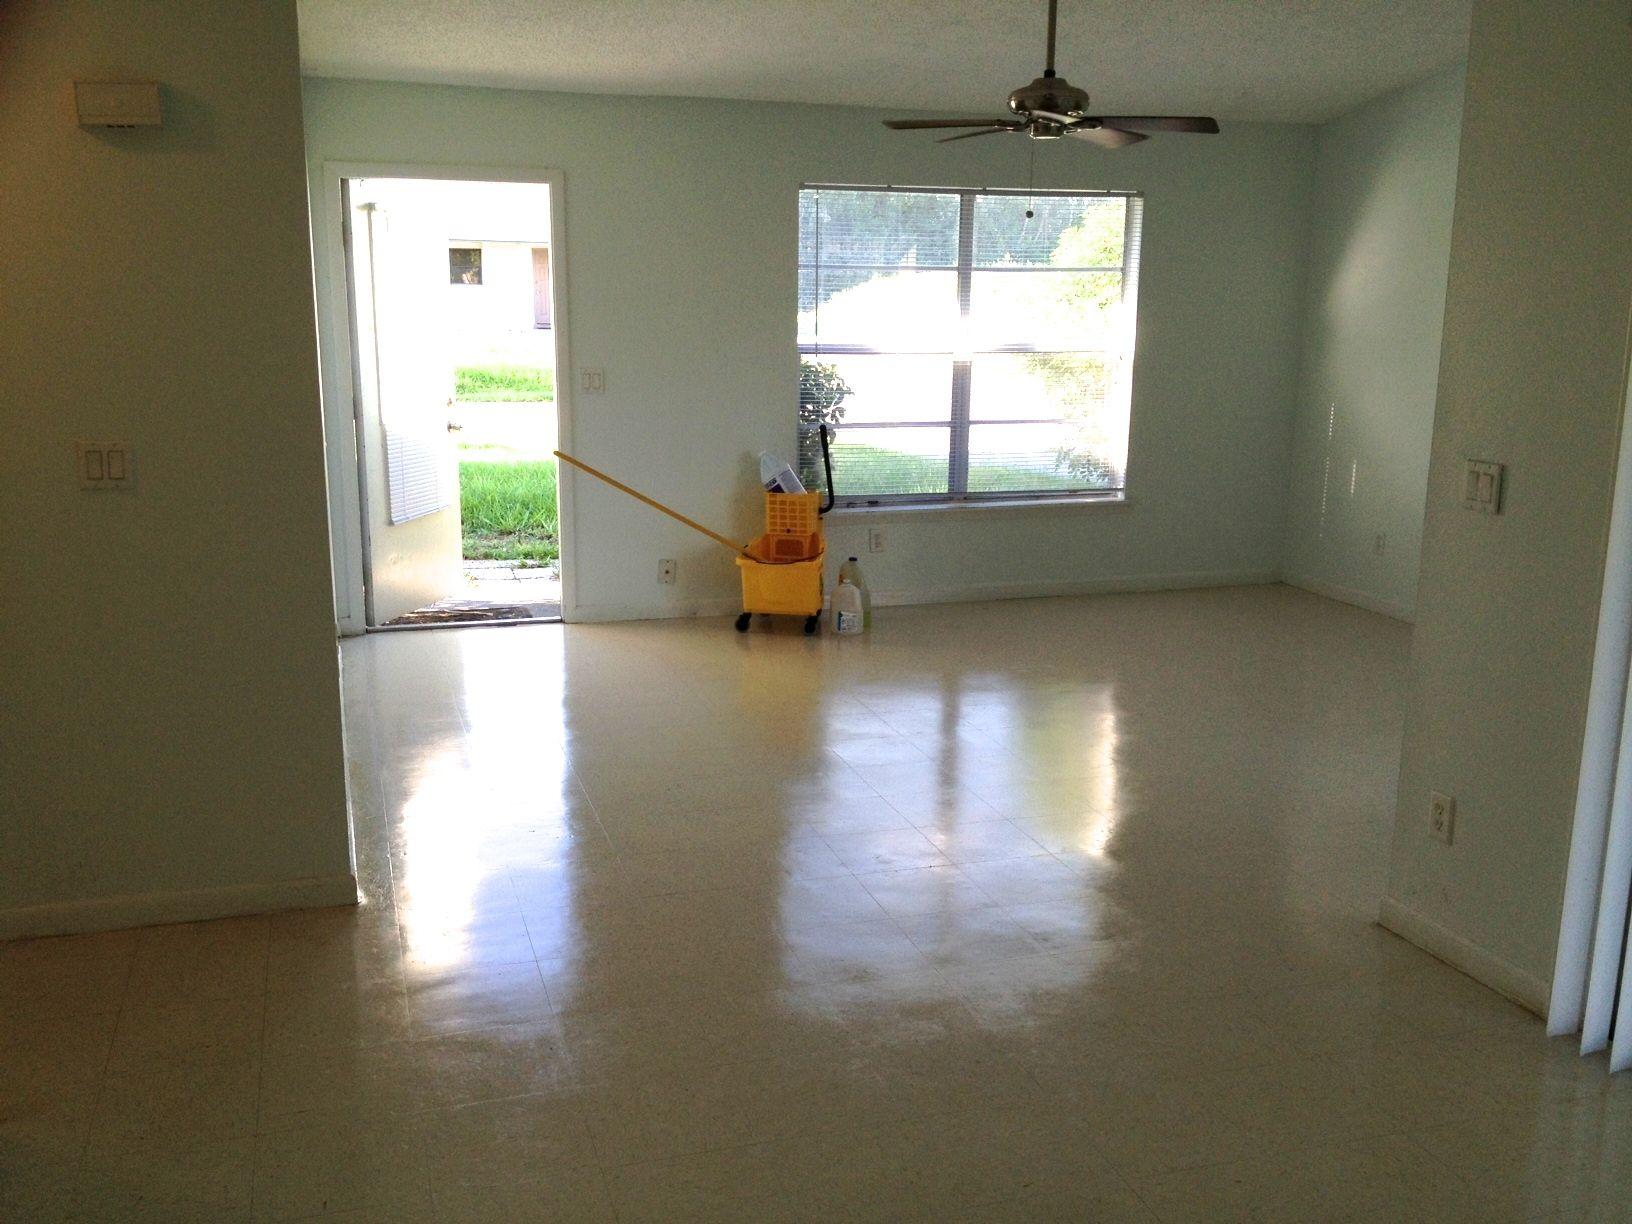 Wax Linoleum Kitchen Floor